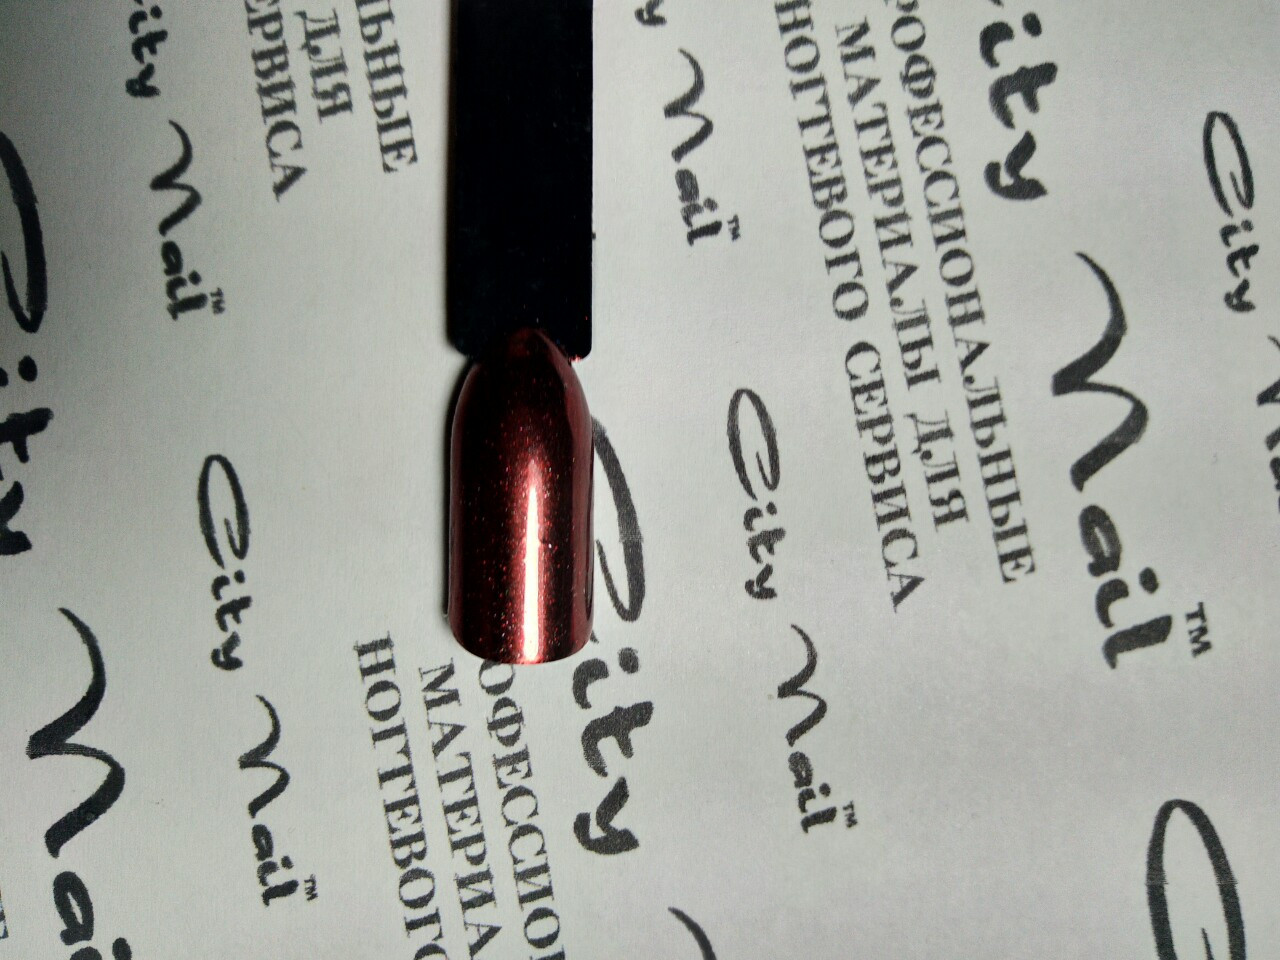 Зеркальная втирка для дизайна ногтей красная